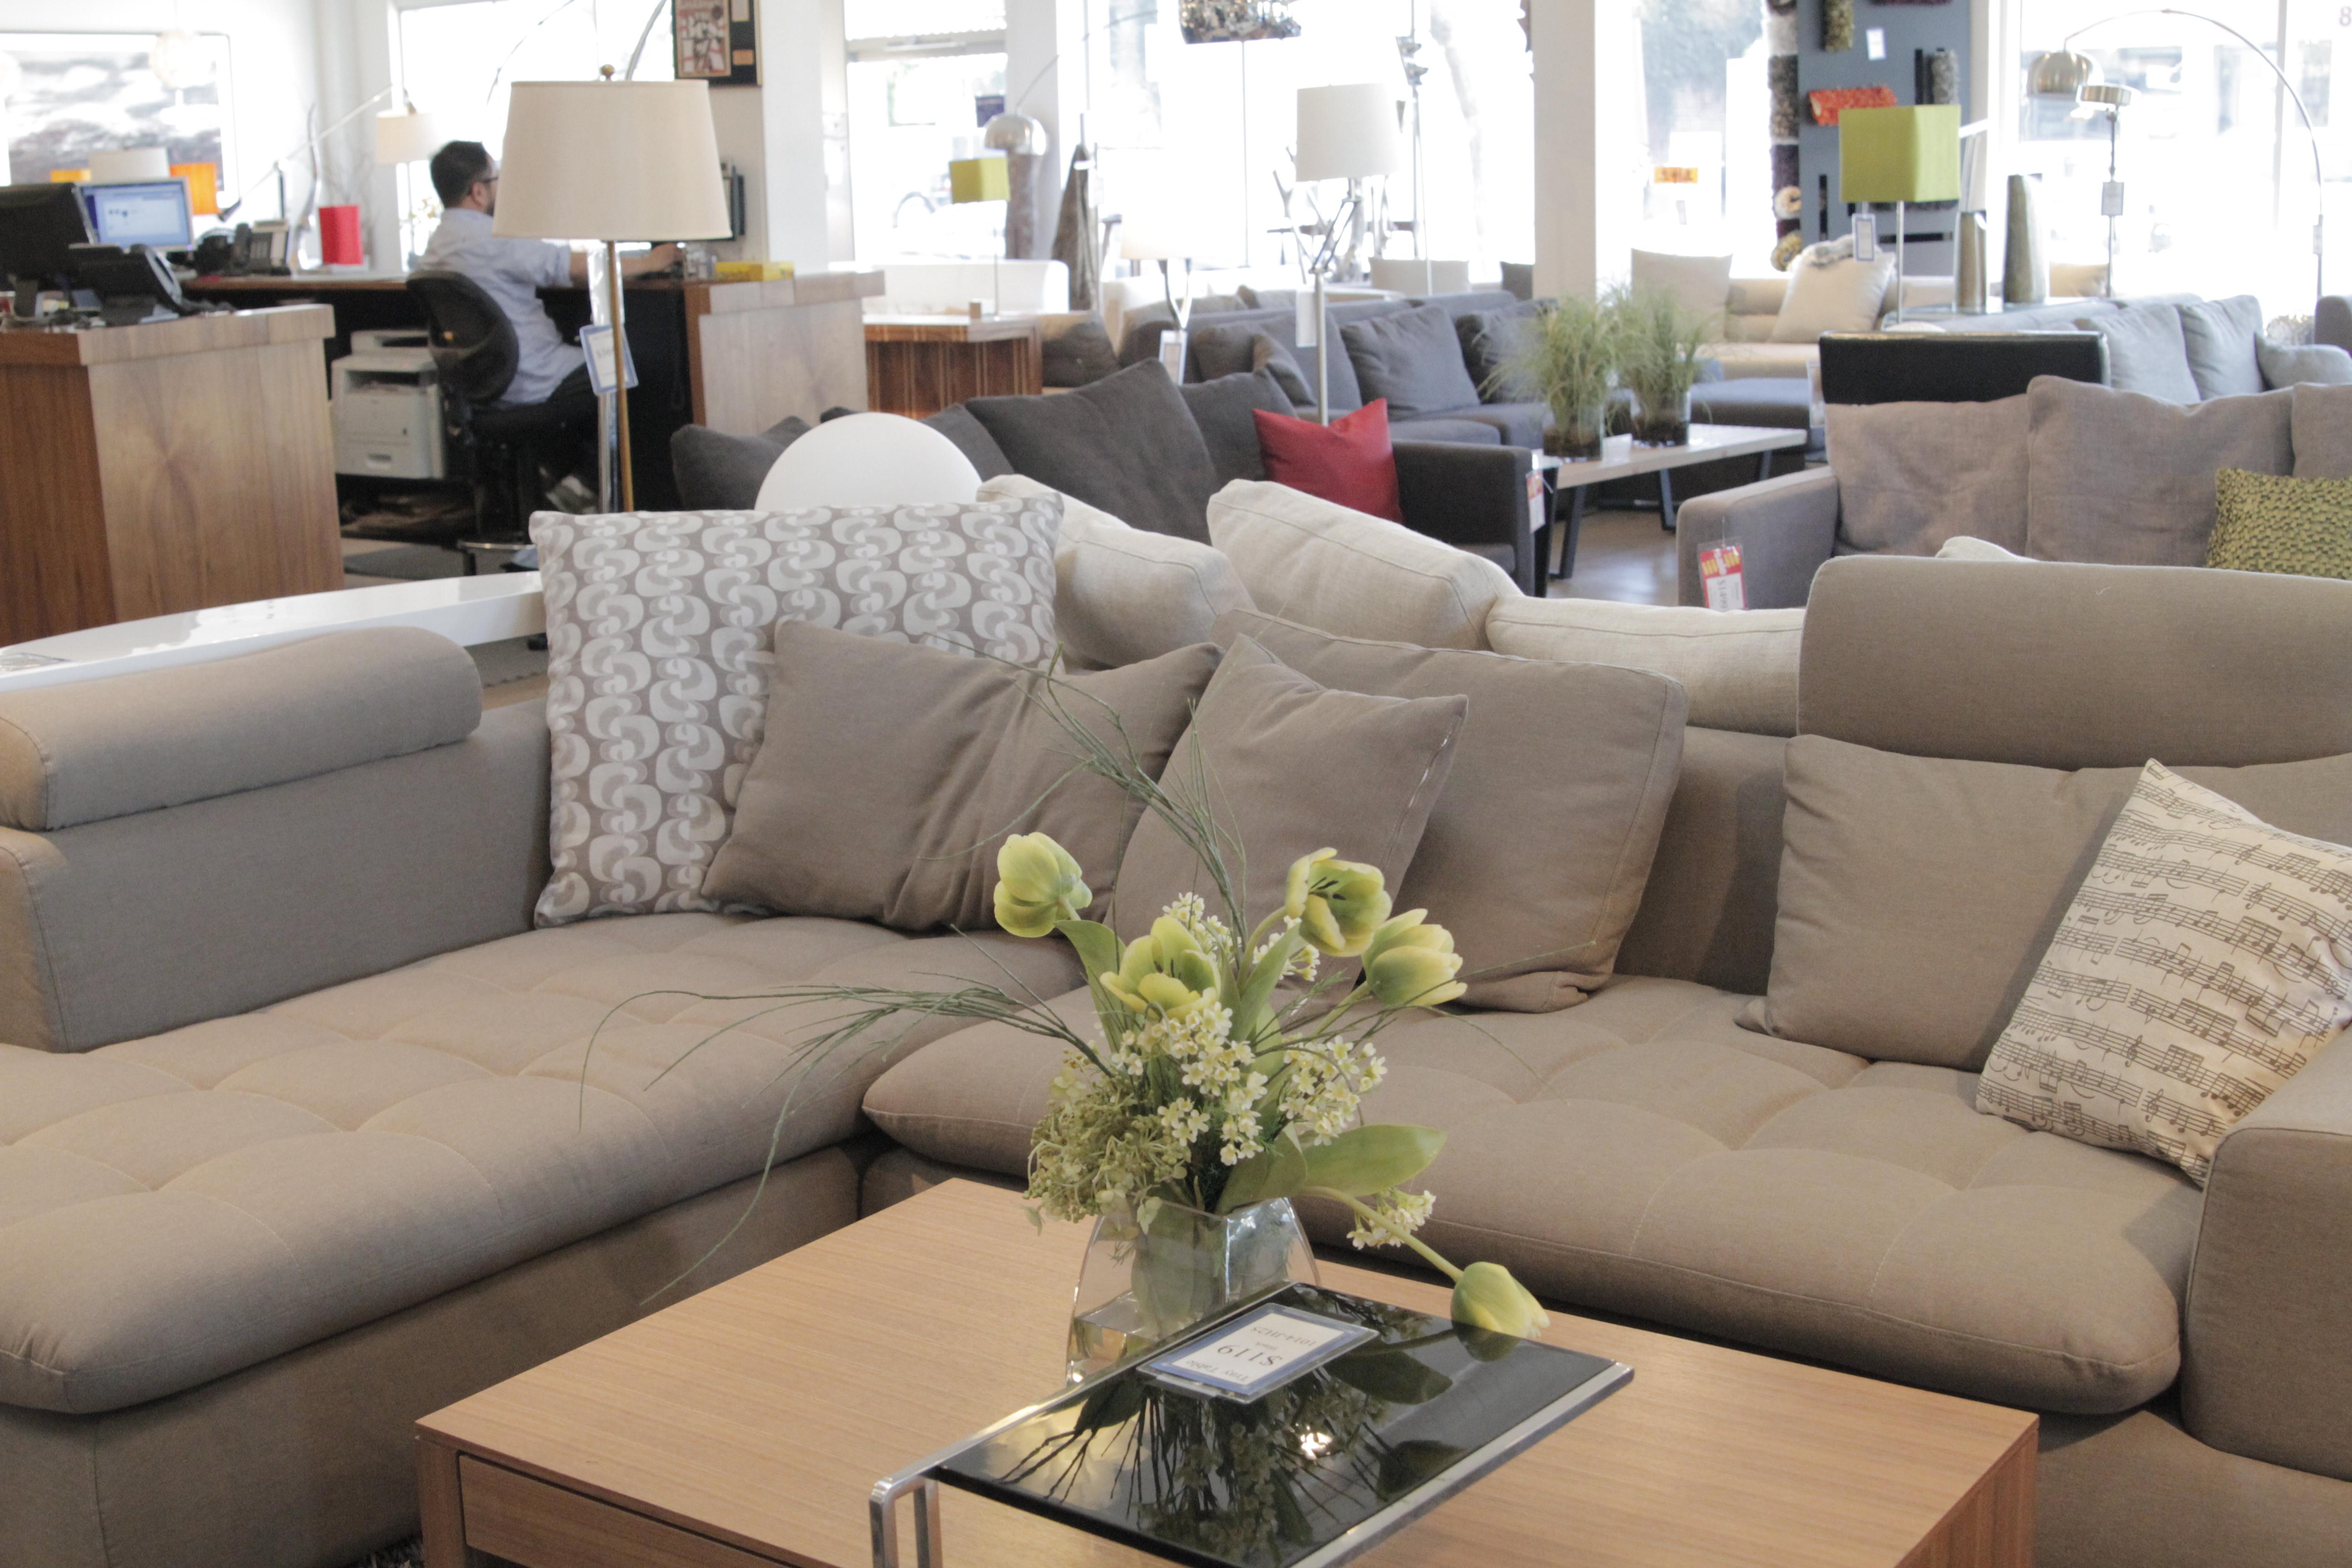 Furniture Blueprints Free